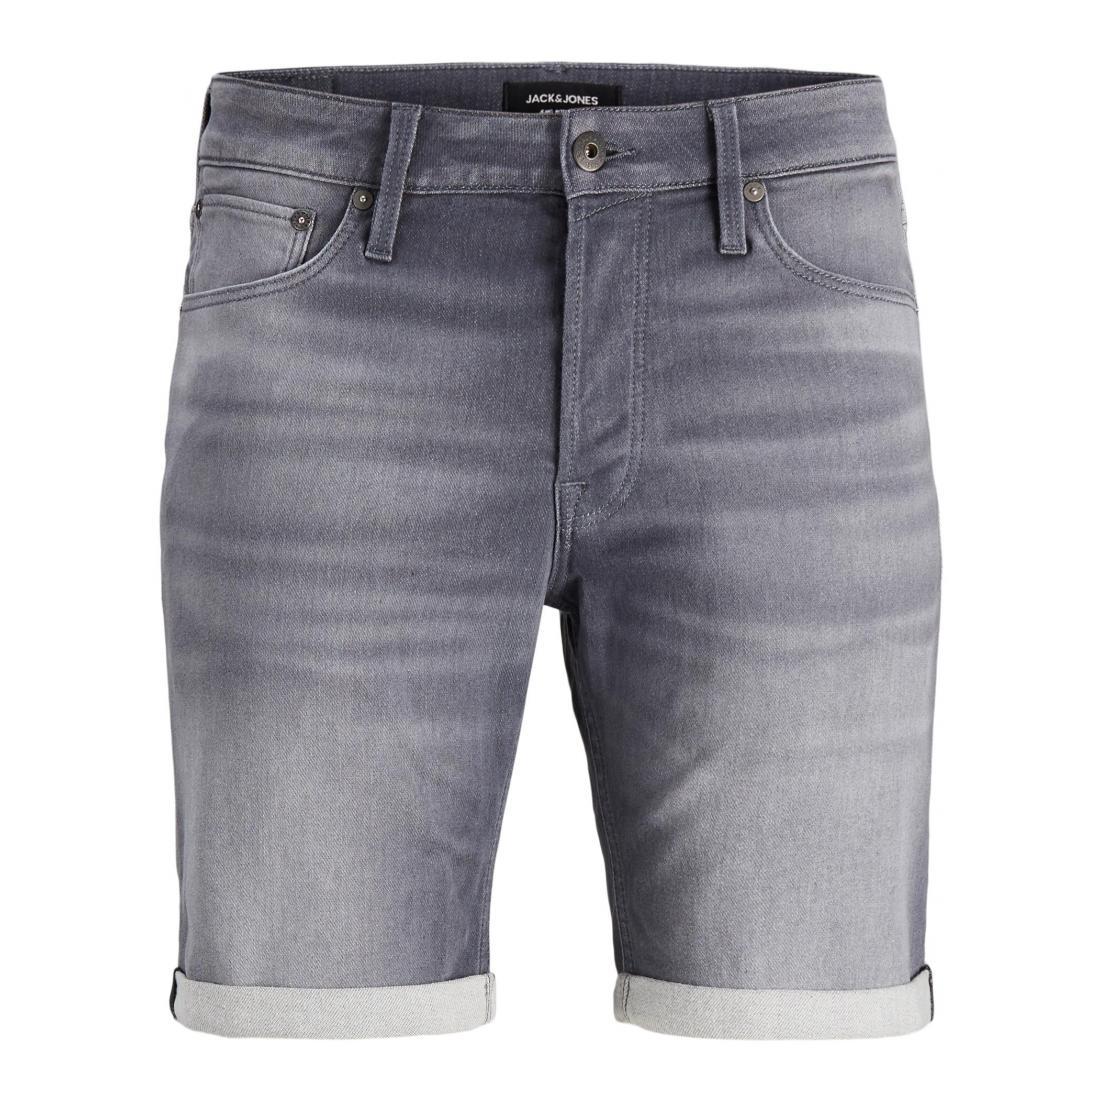 Jack & Jones Bermuda/Shorts Herren JJIRICK JJICON SHORTS GE